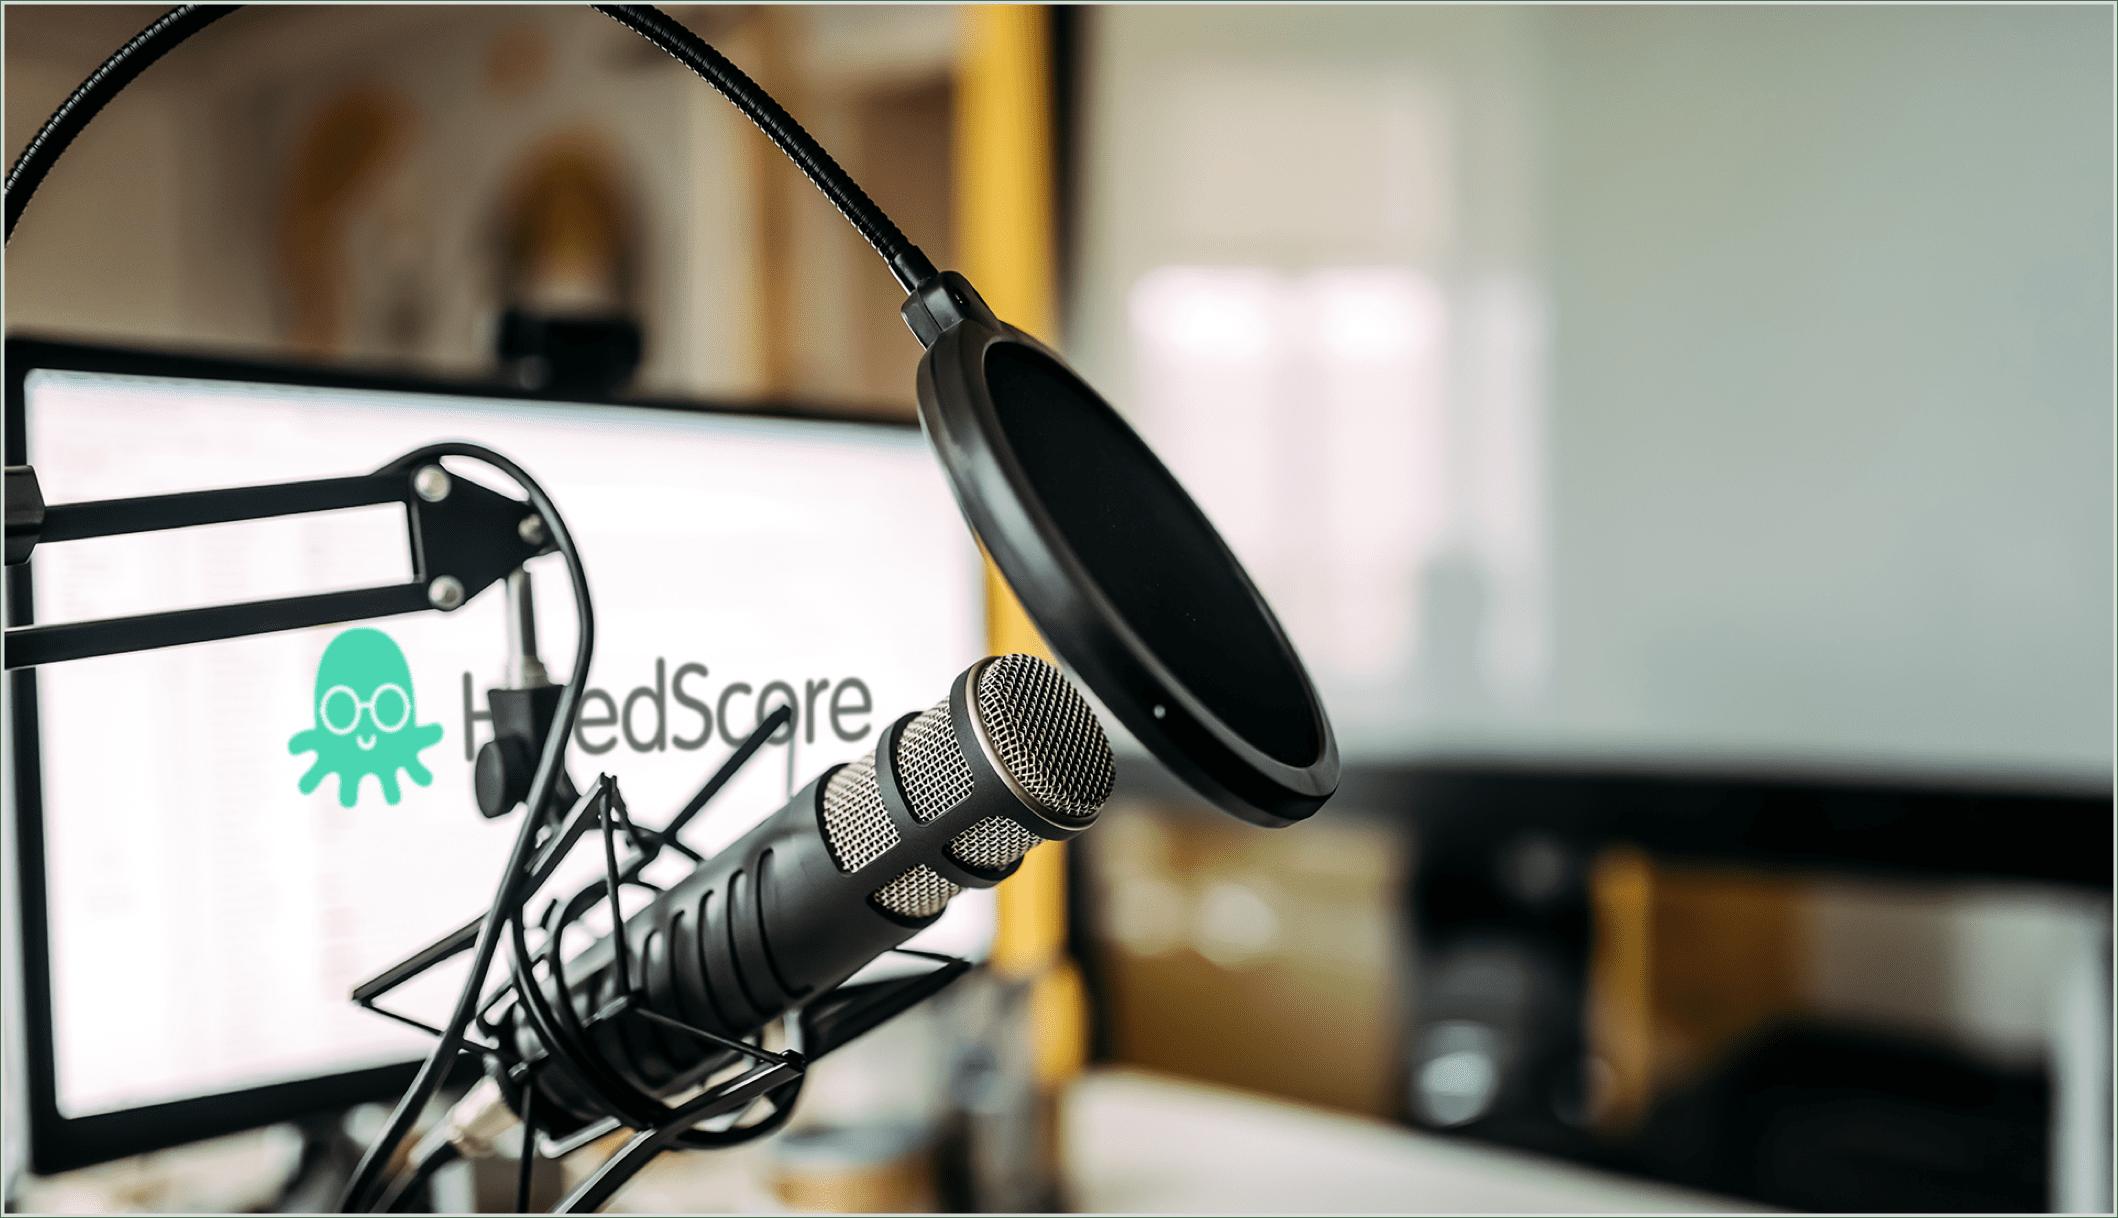 HiredScore CEO Athena Karp Featured on Littler's Big Data Podcast Series